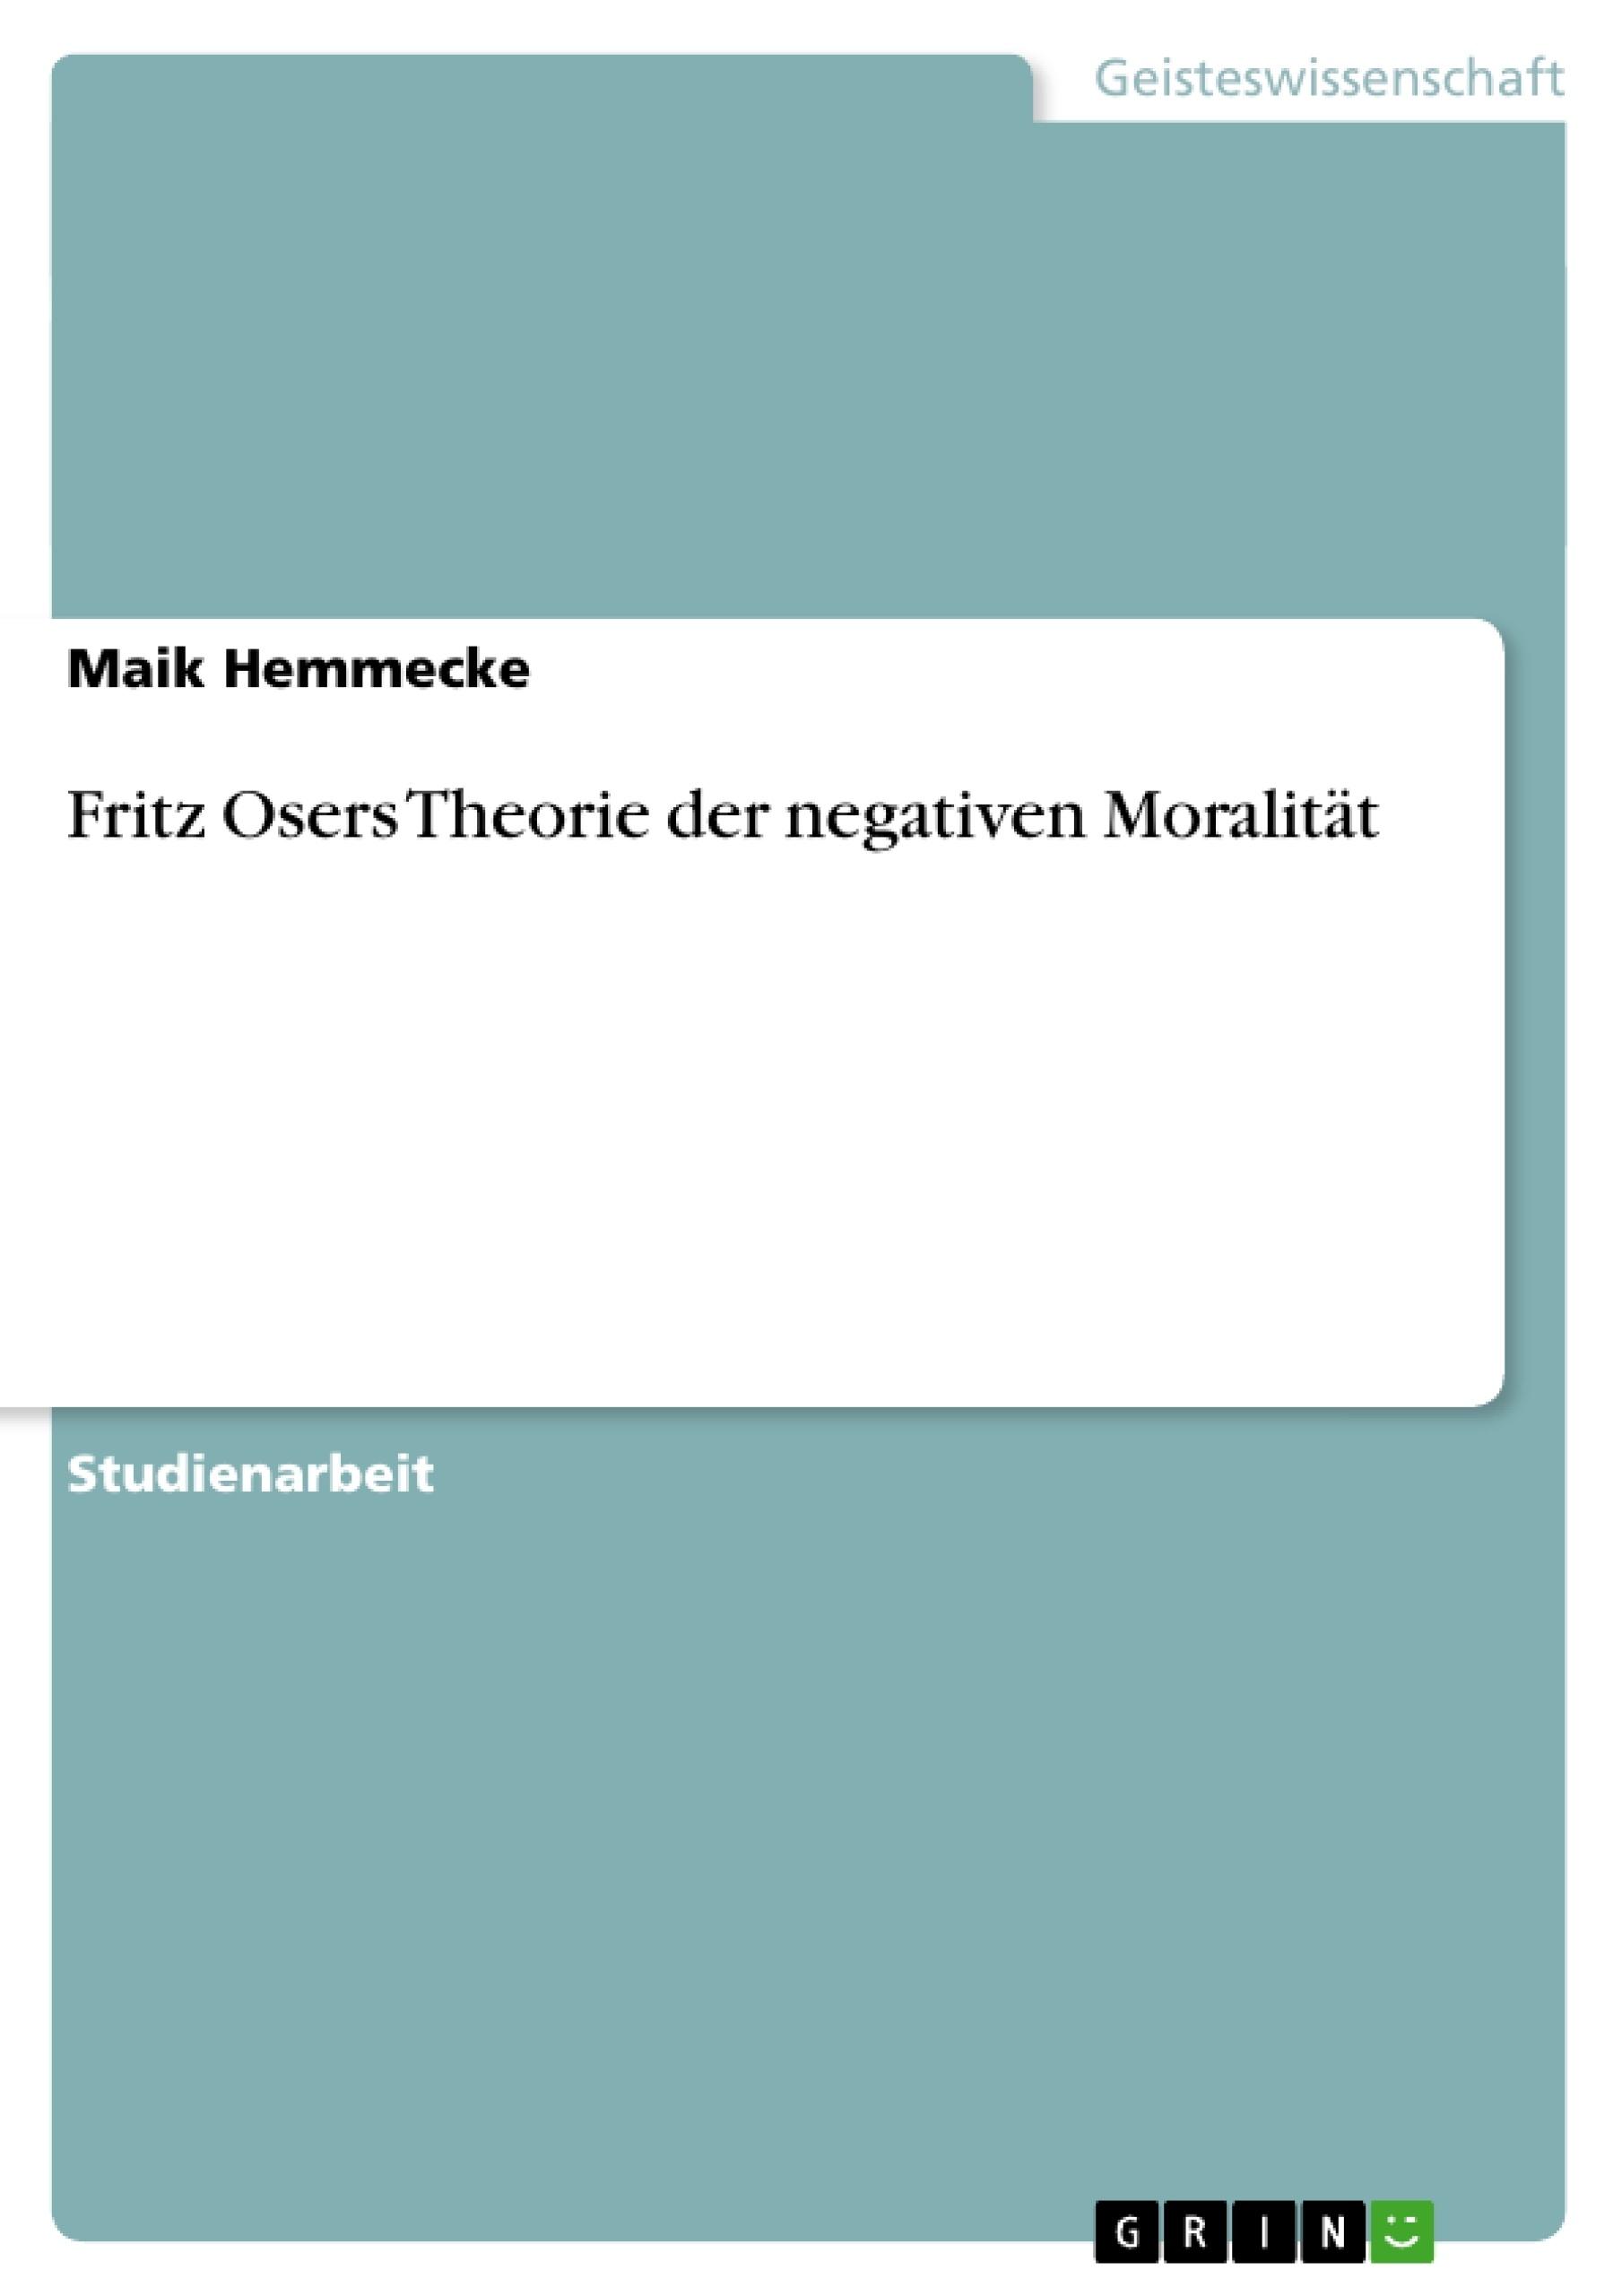 Titel: Fritz Osers Theorie der negativen Moralität